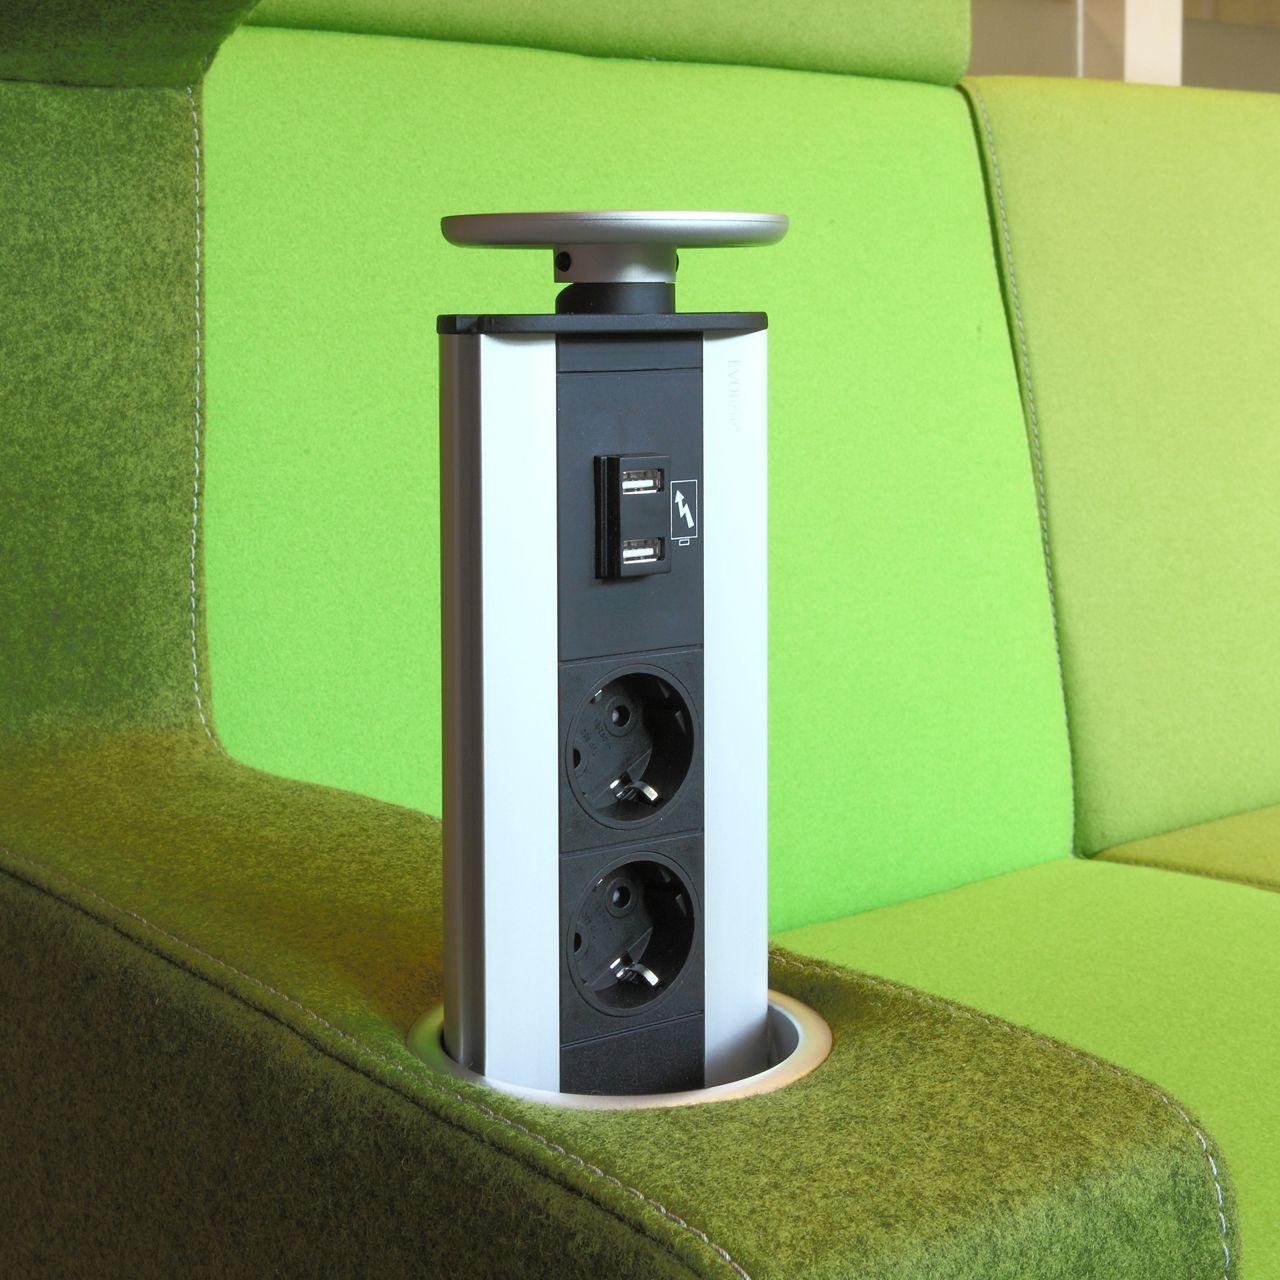 modulair akoestisch meubilair met stekkerdoos